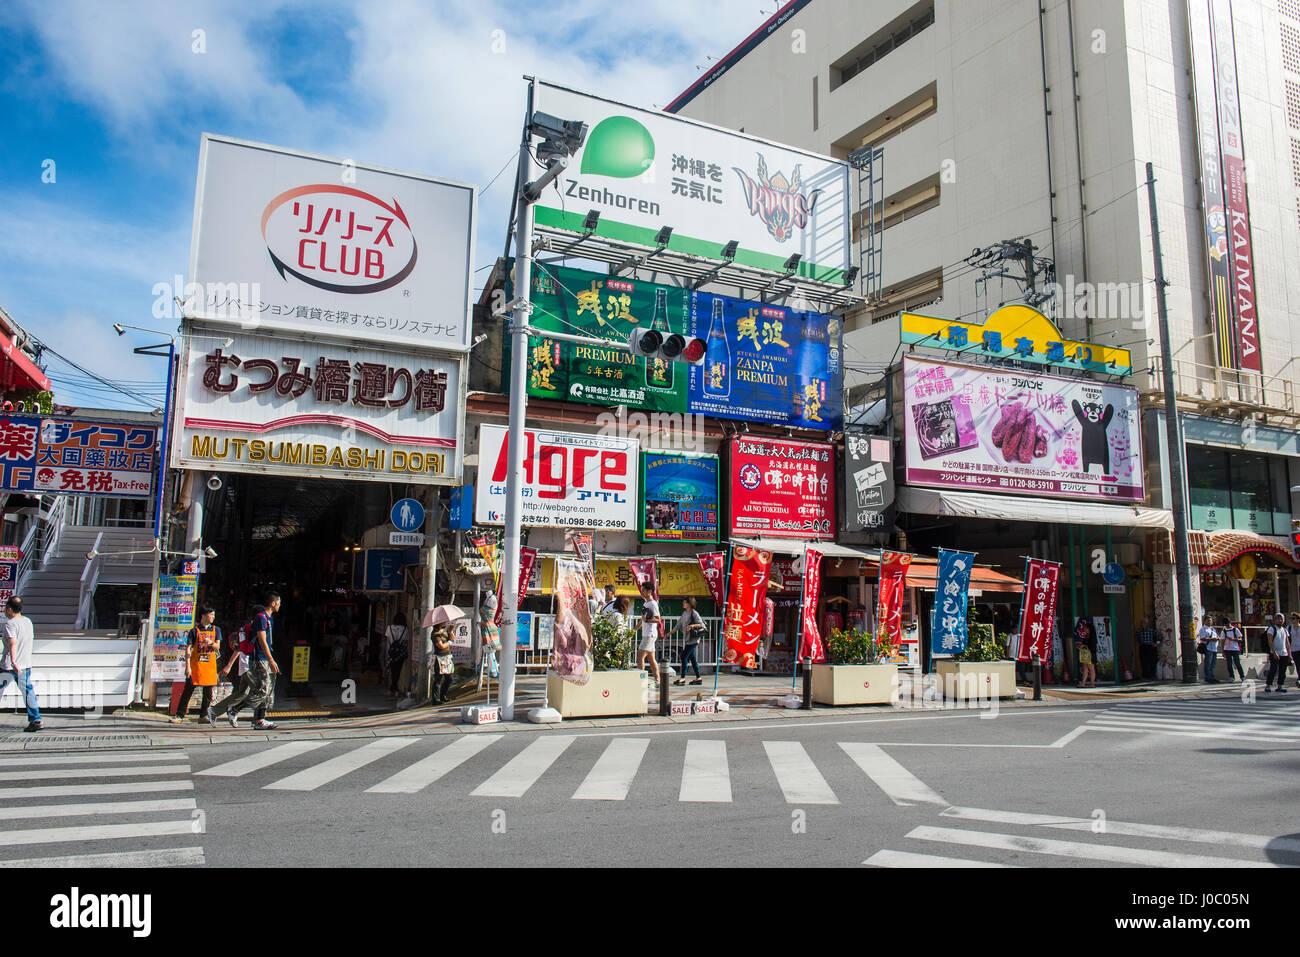 Business district, Naha, Okinawa, Japan, Asia - Stock Image